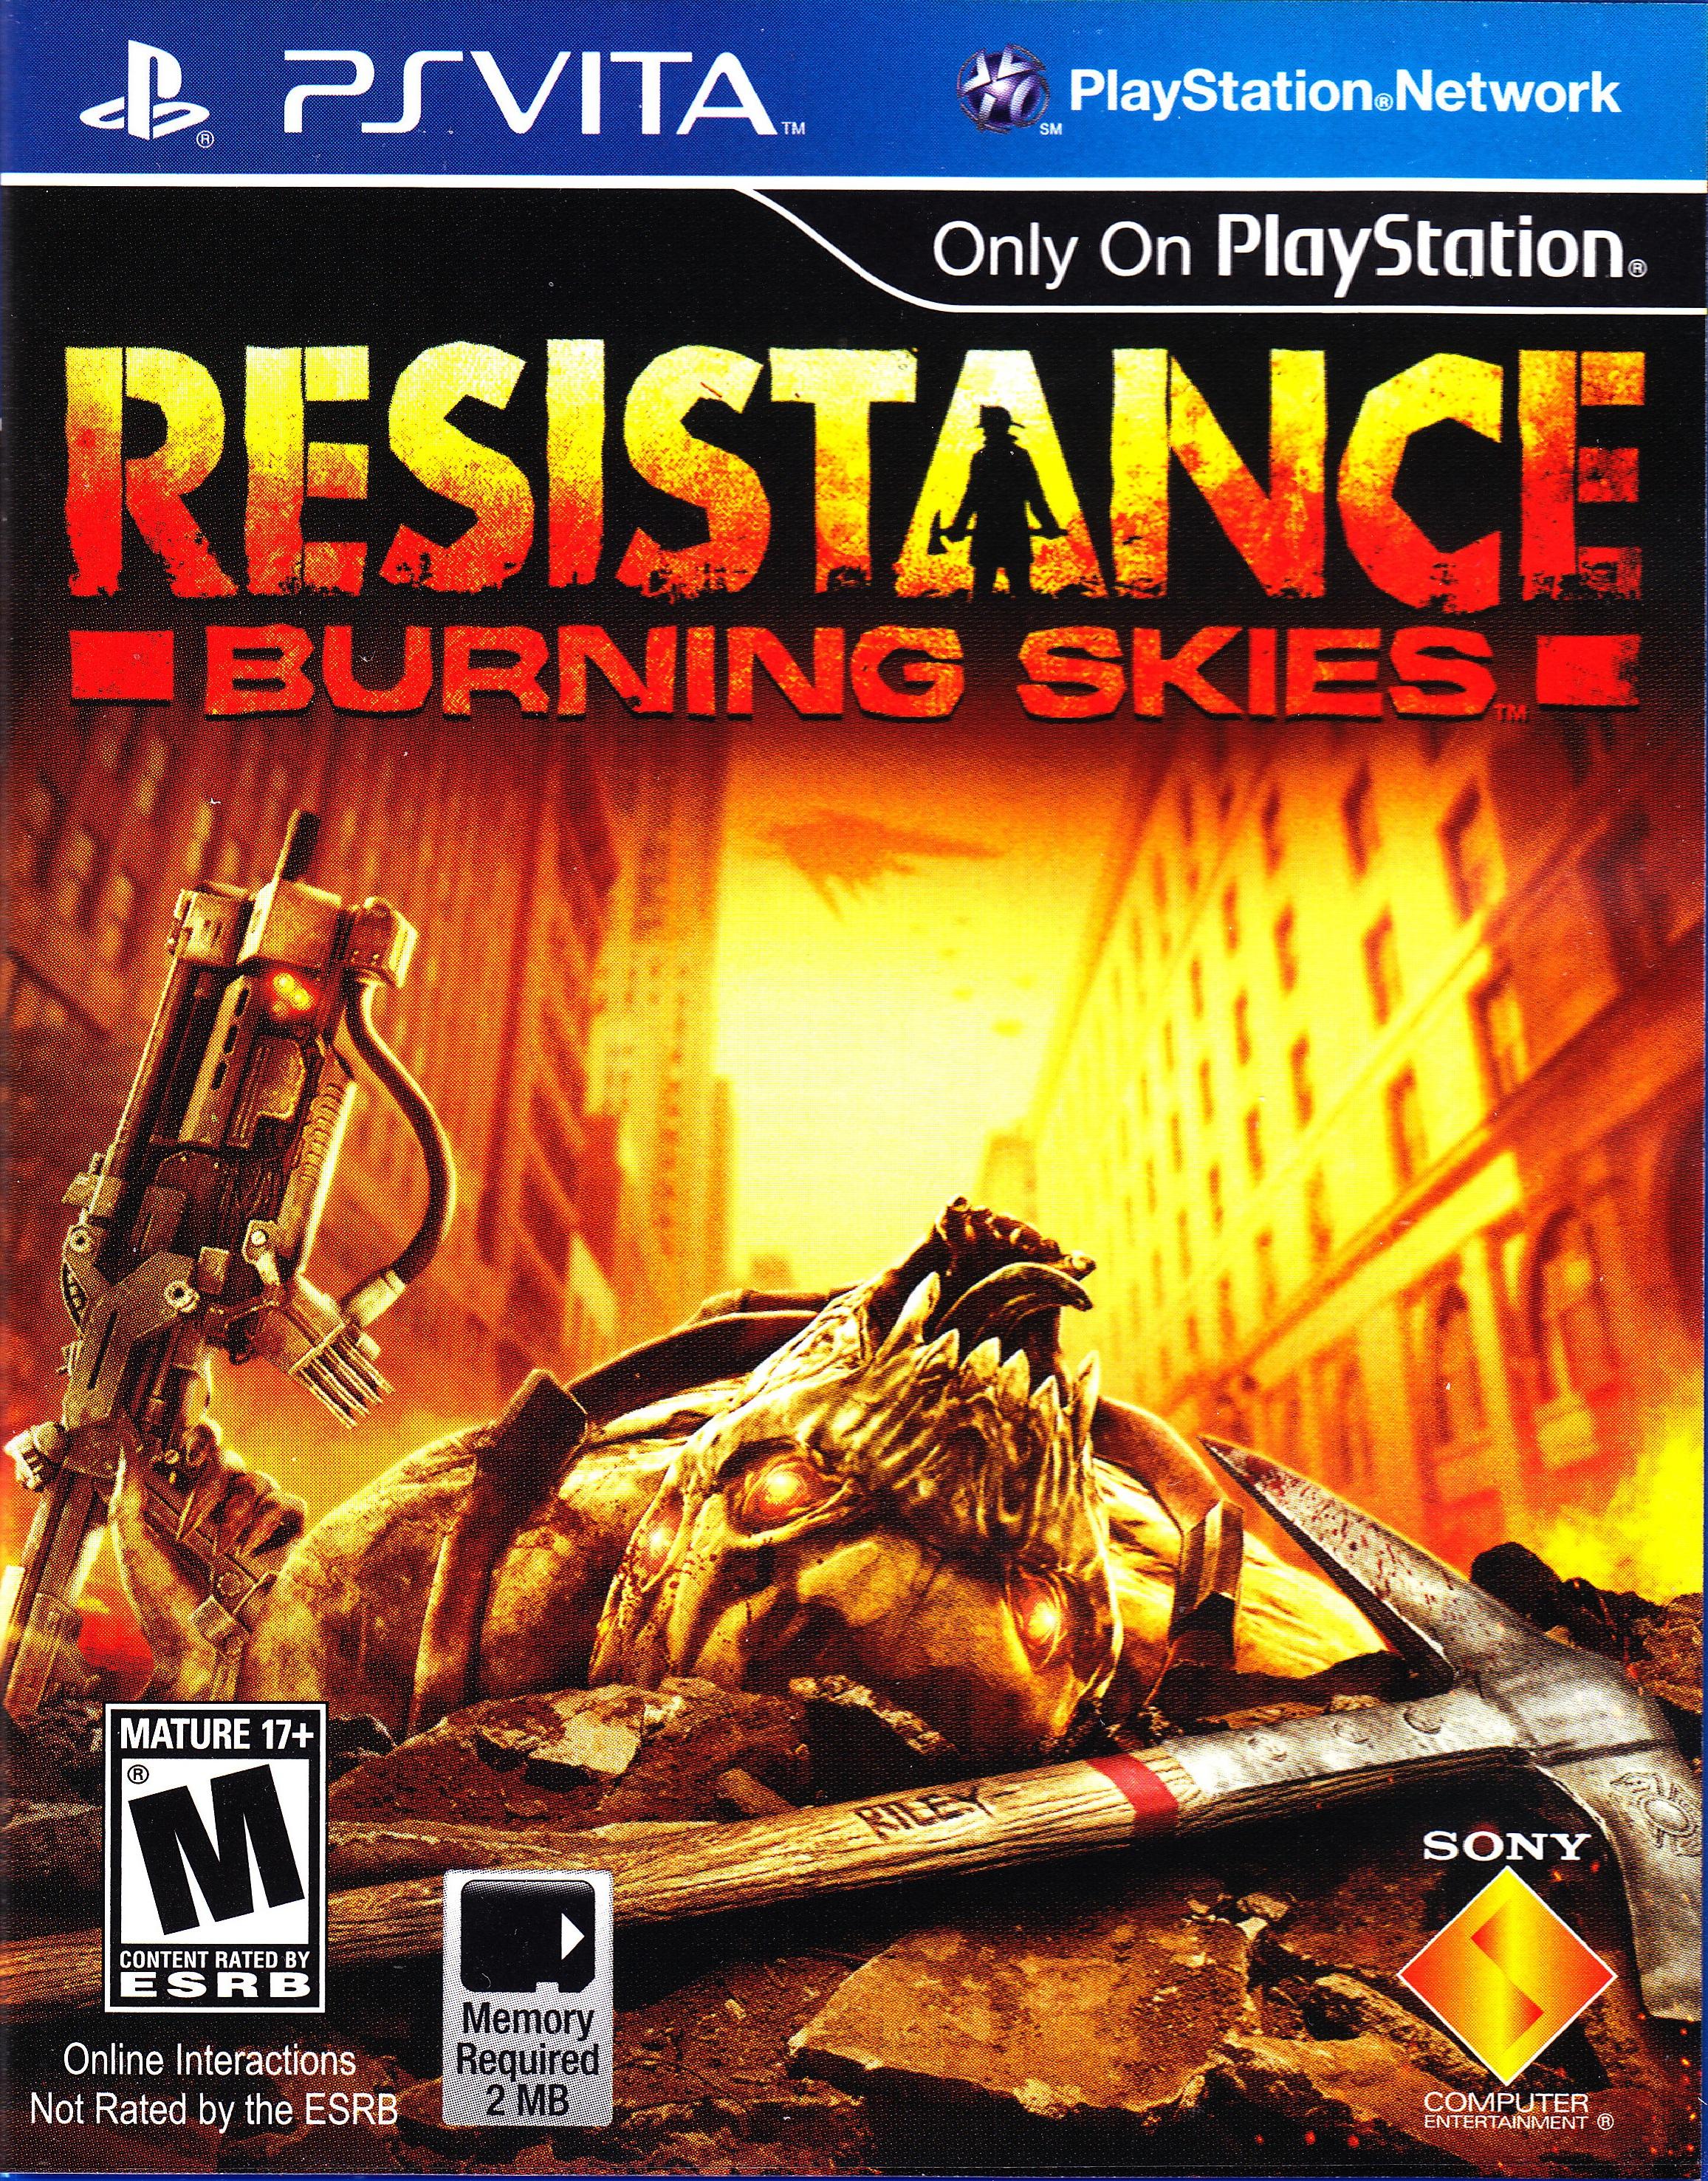 Resistance: Burning Skies